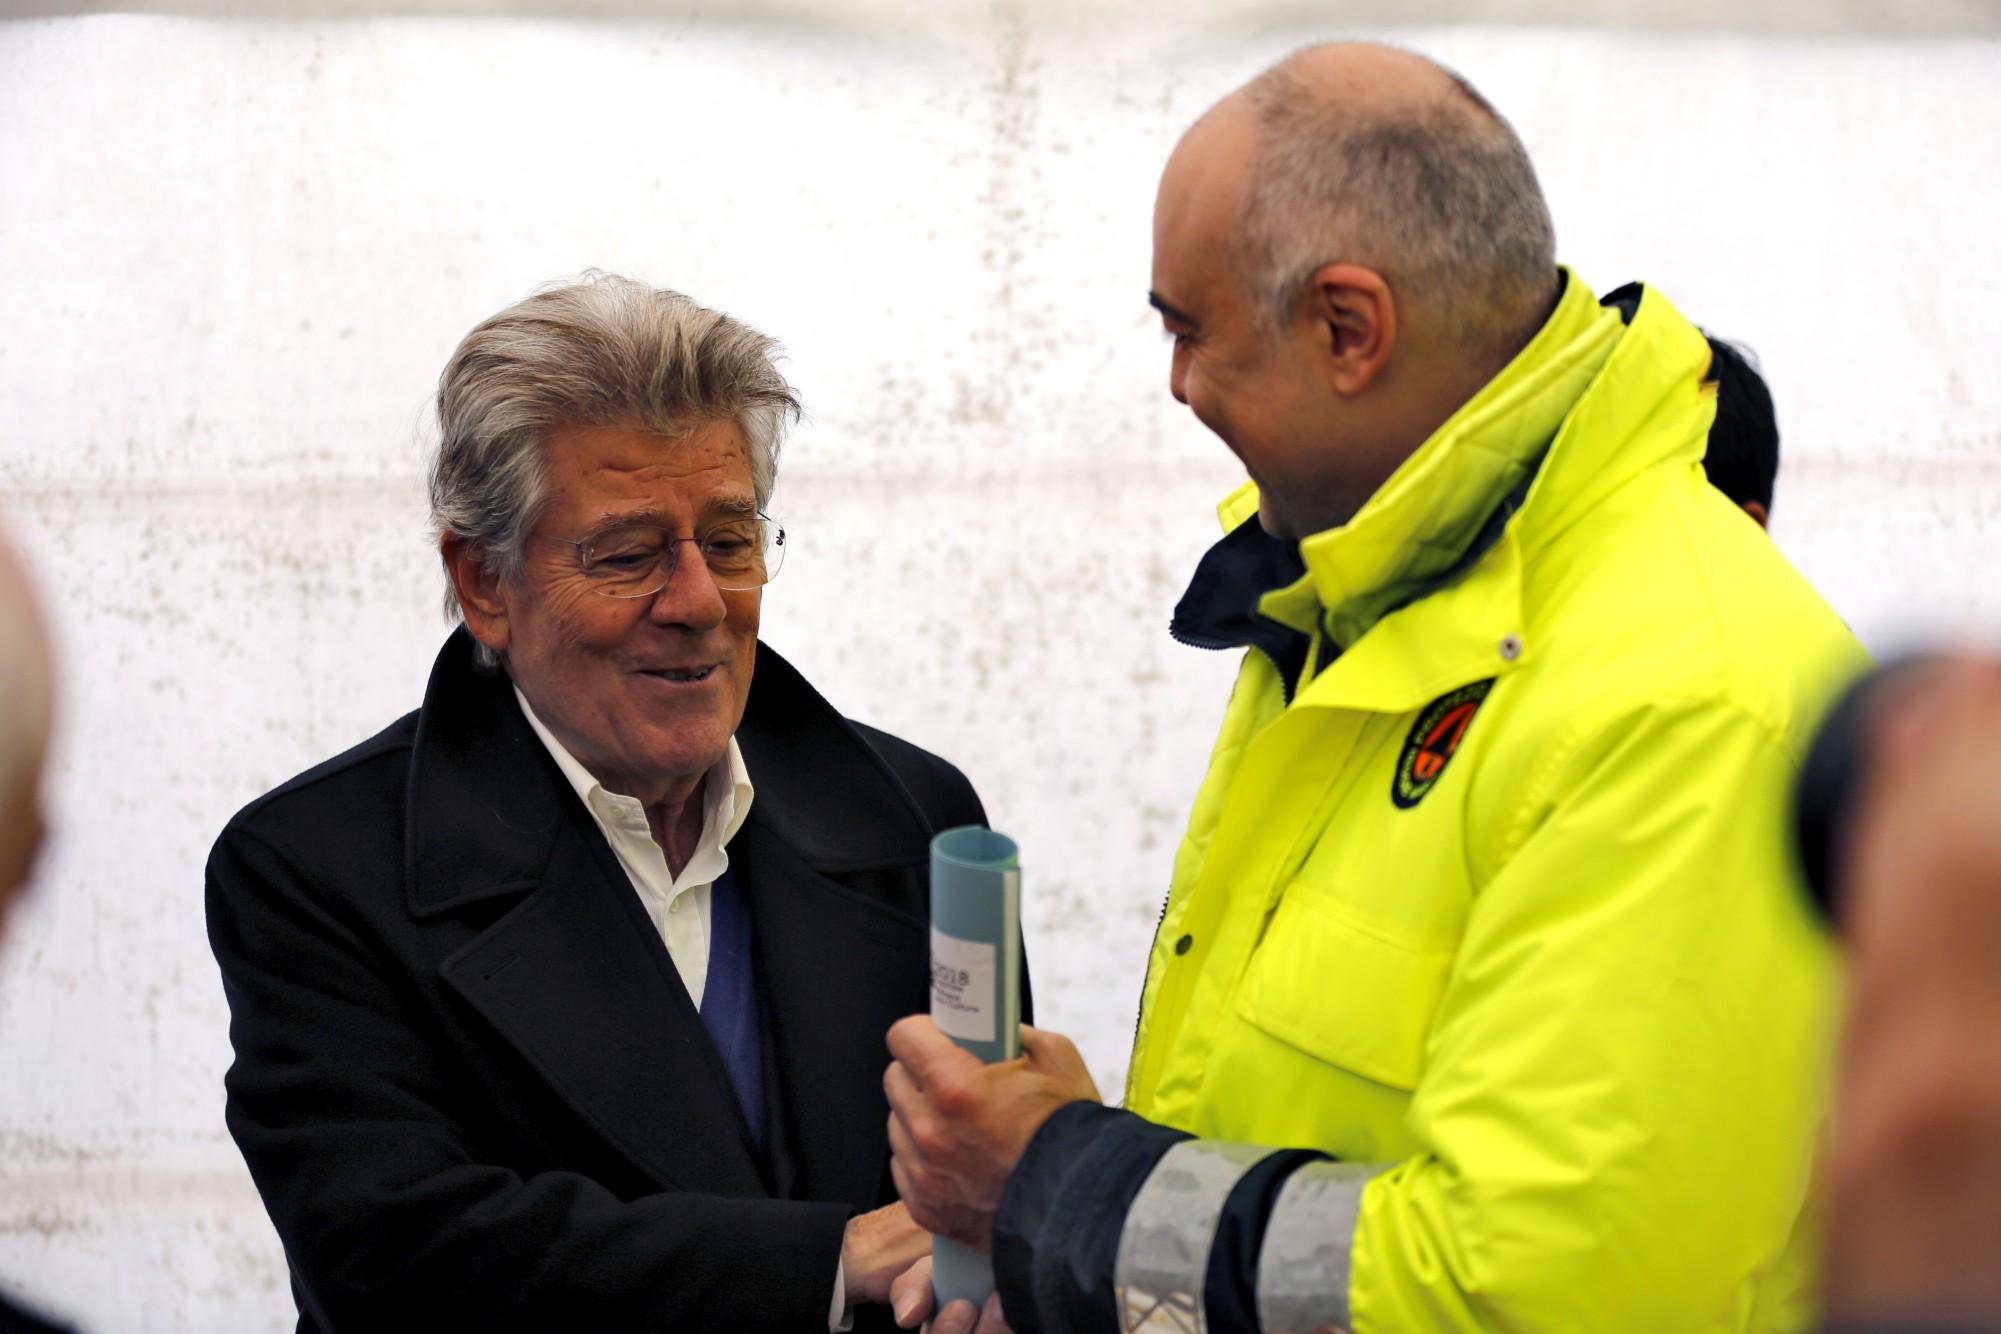 Adolfo Guzzini with Visso Mayor Giuliano Pazzaglini